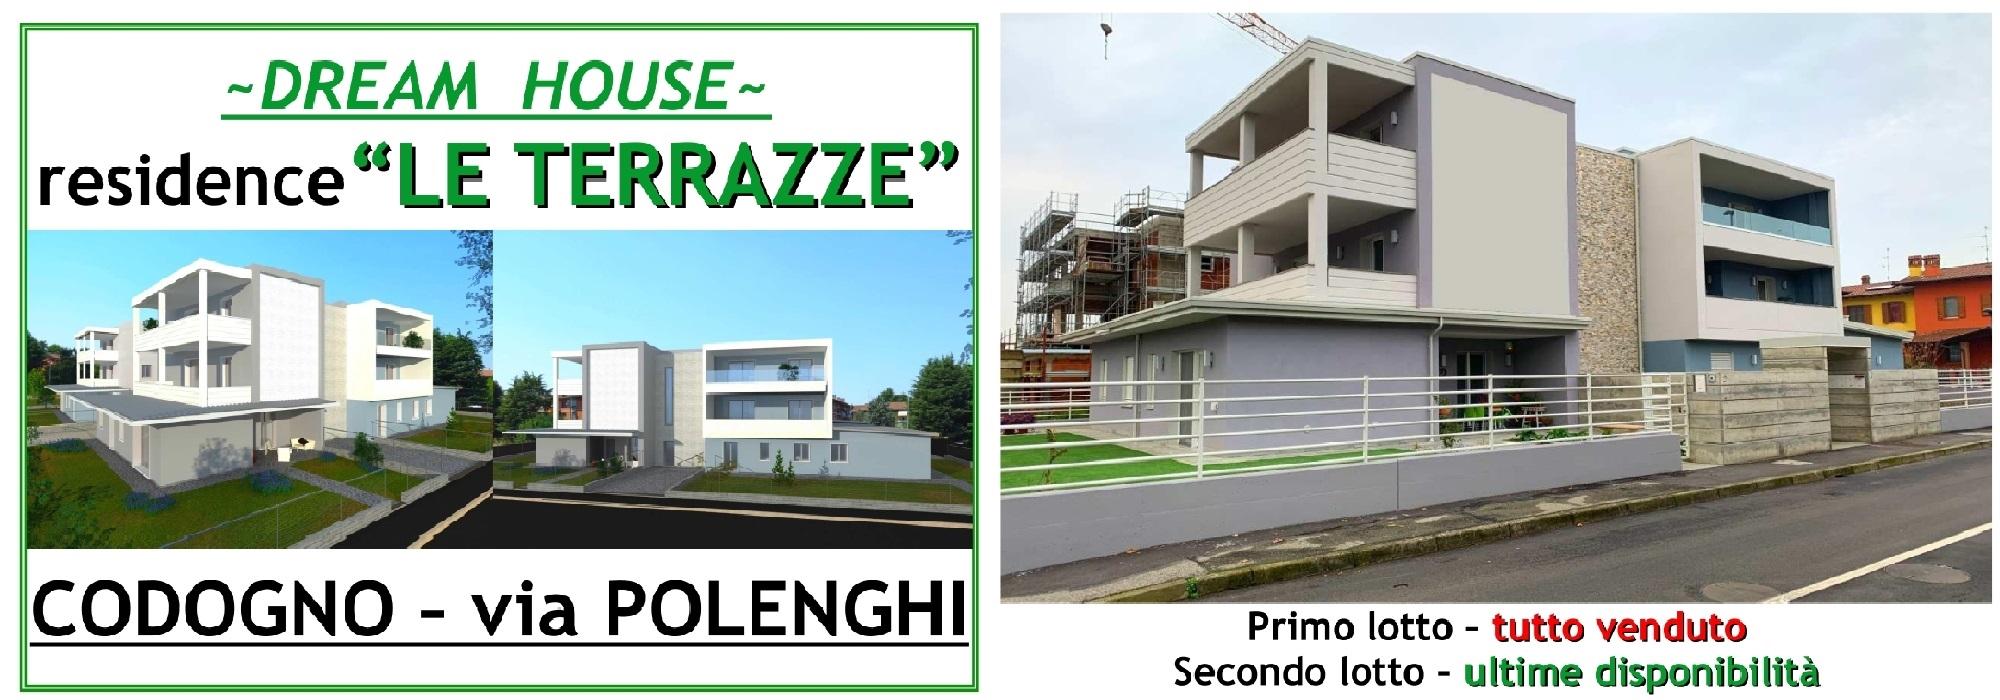 "VIA POLENGHI, CODOGNO – RESIDENCE ""LE TERRAZZE"""